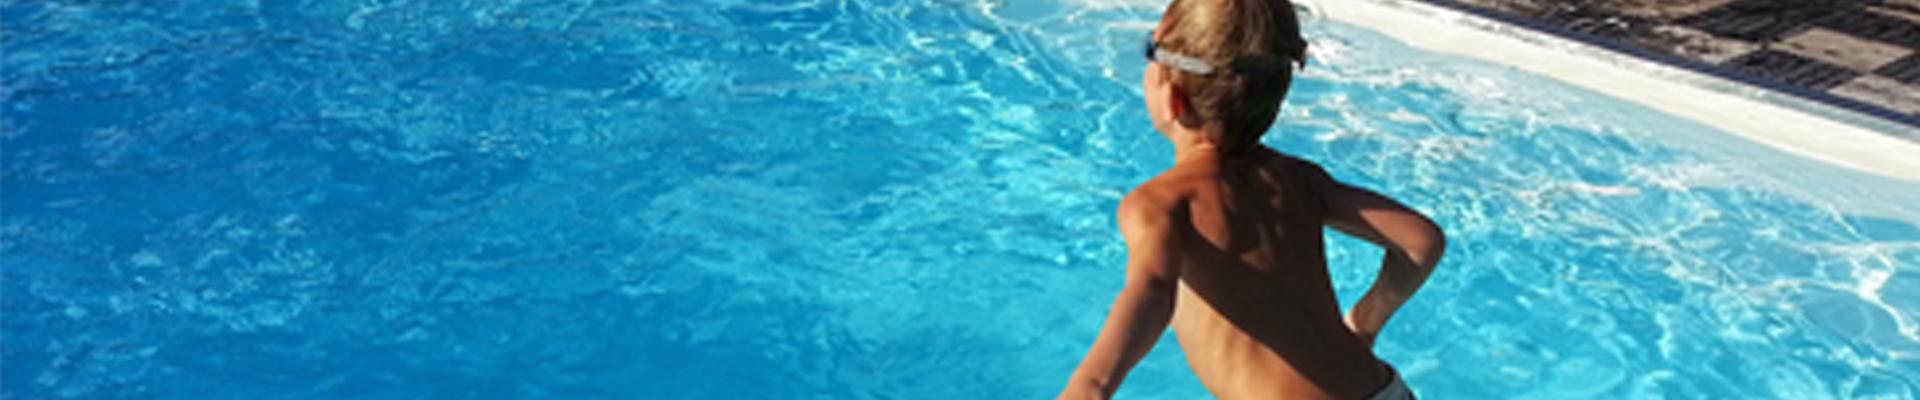 entretenir sa piscine correctement